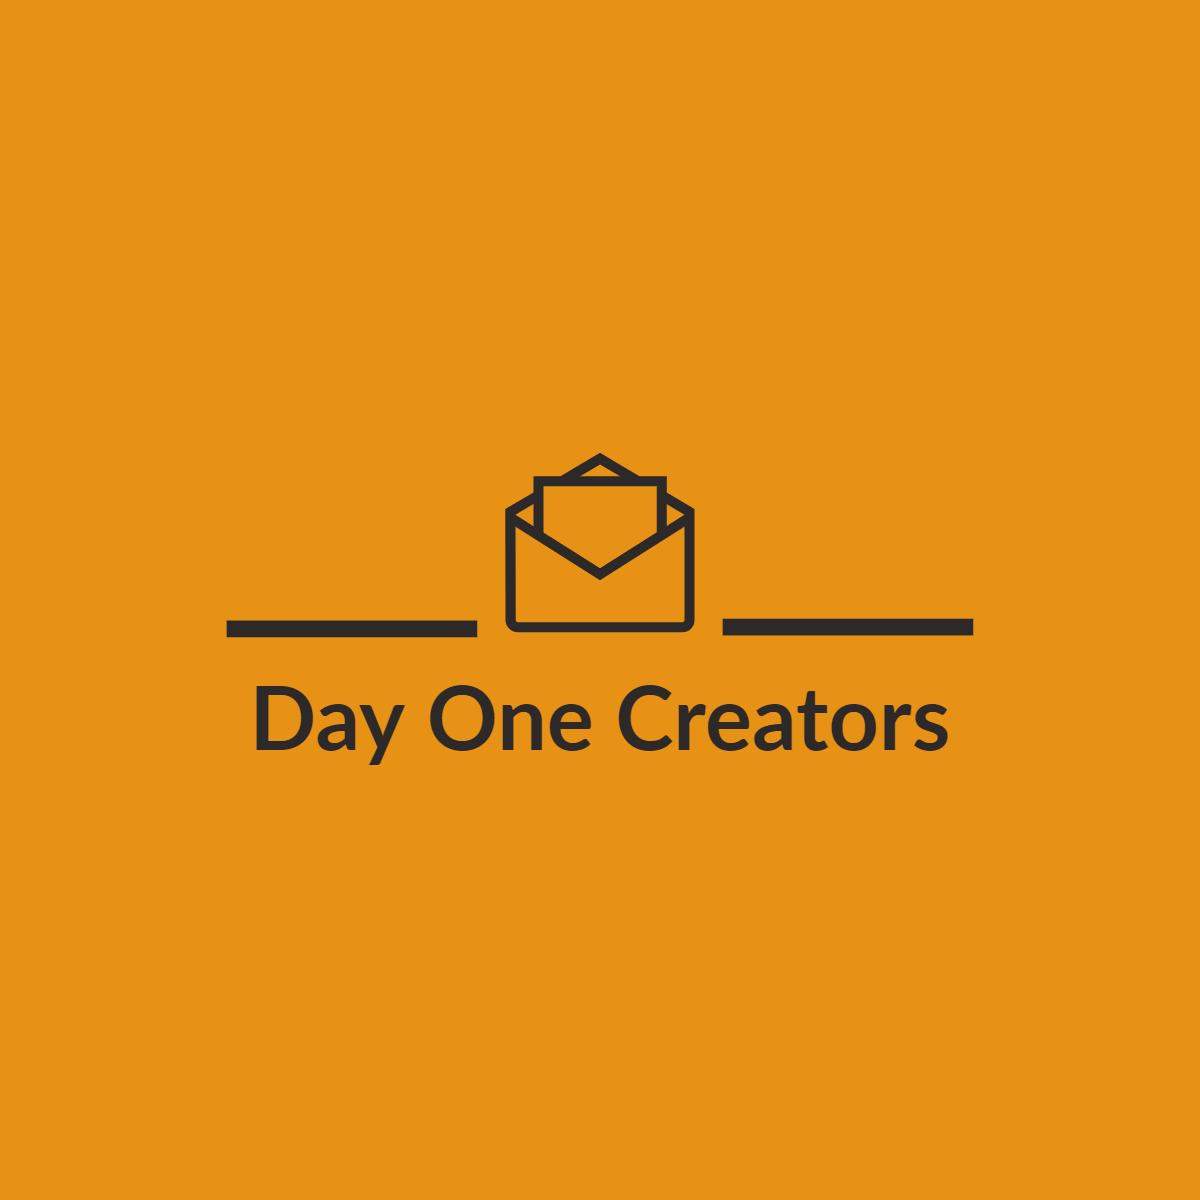 Day One Creators